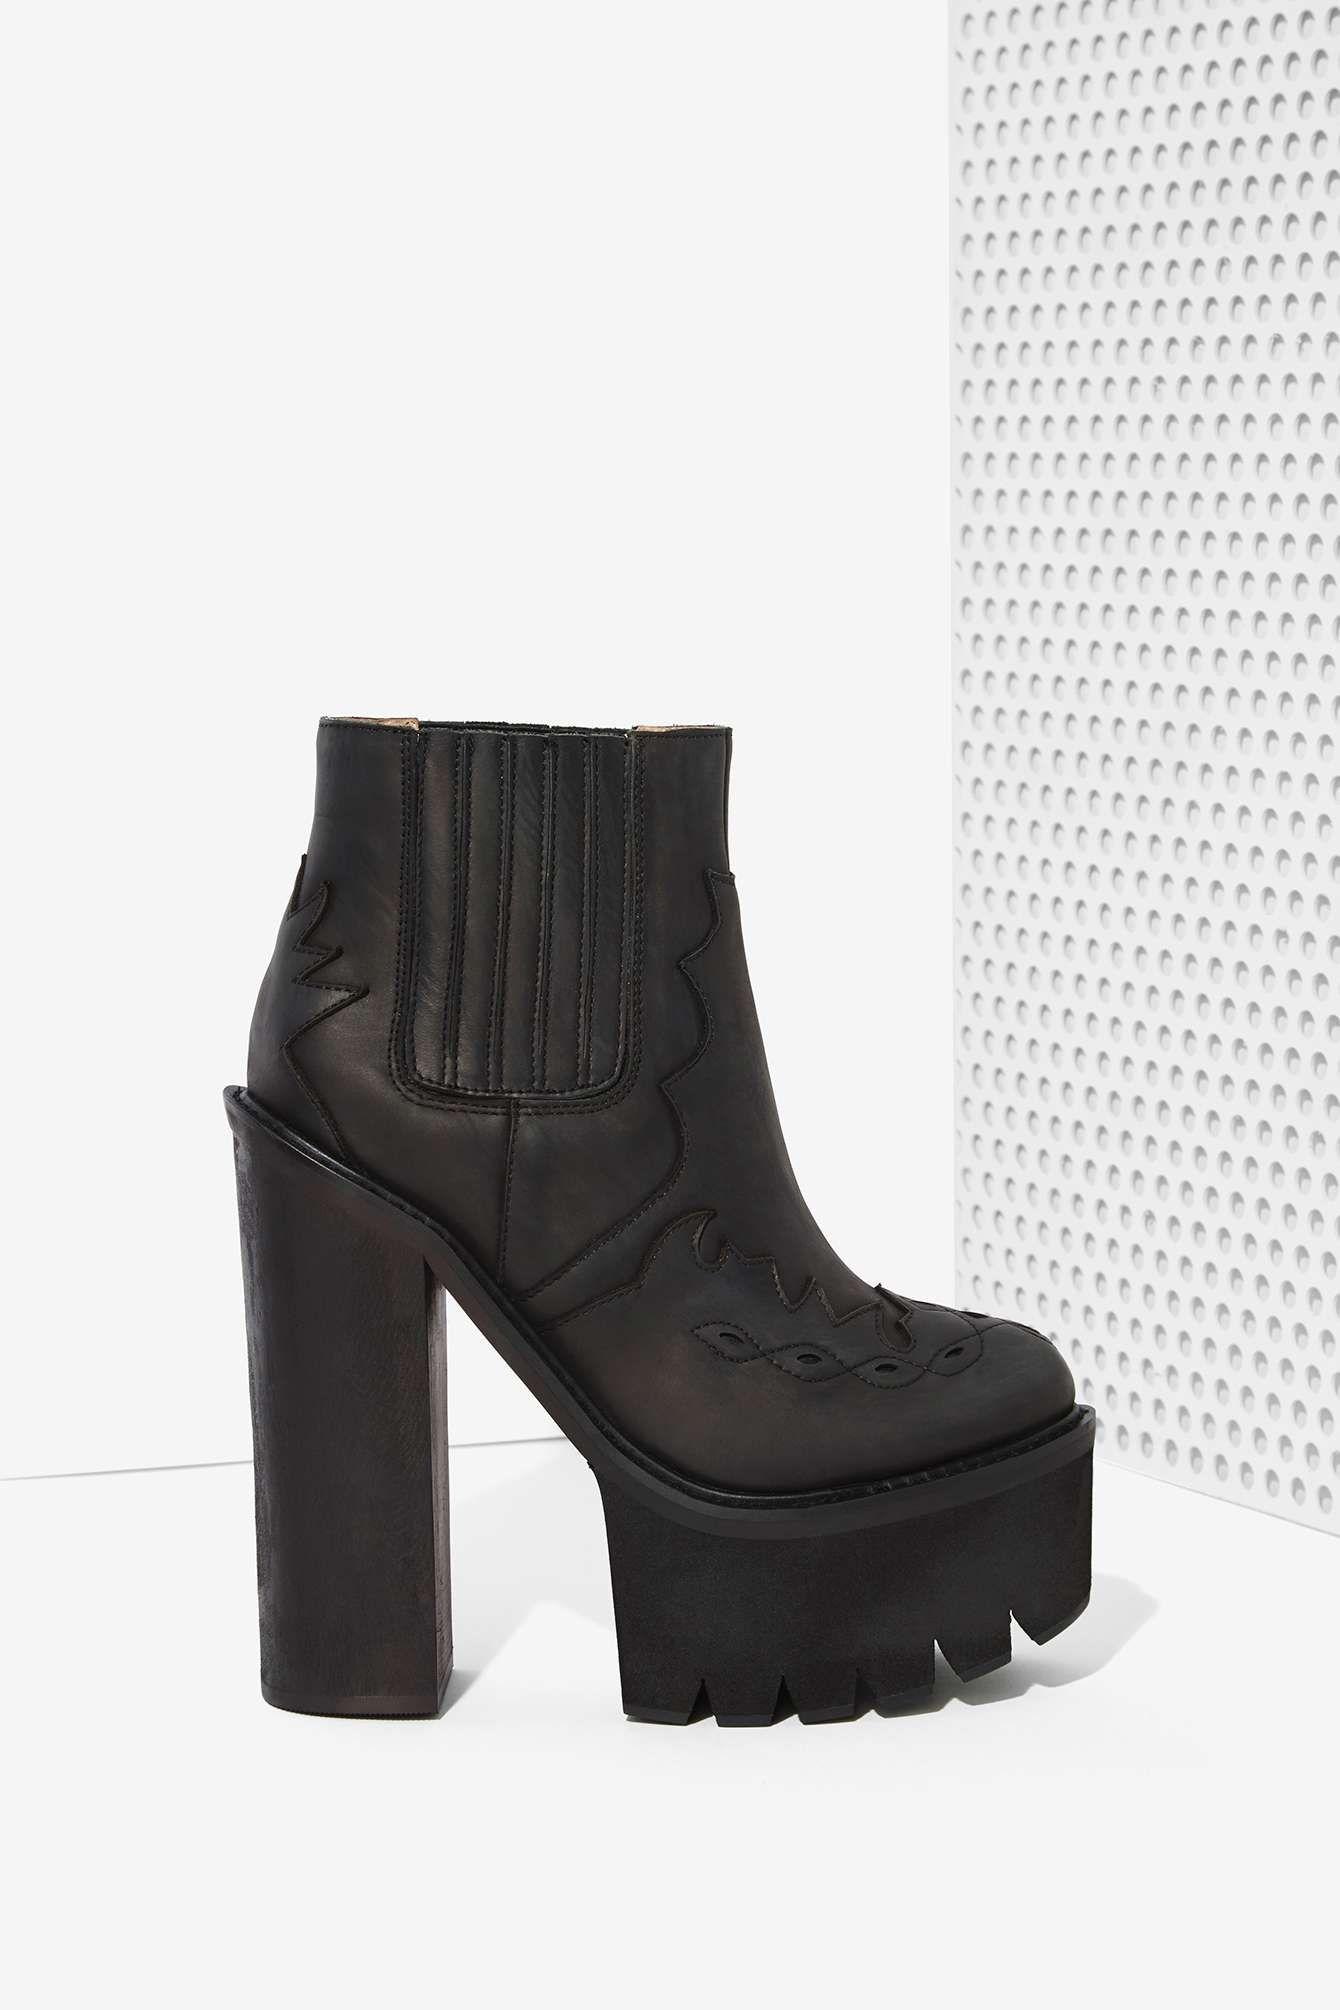 Jeffrey Campbell Bounty Leather Platform Boot Zapatos Zapatos Zapatos <3 b3ddfe